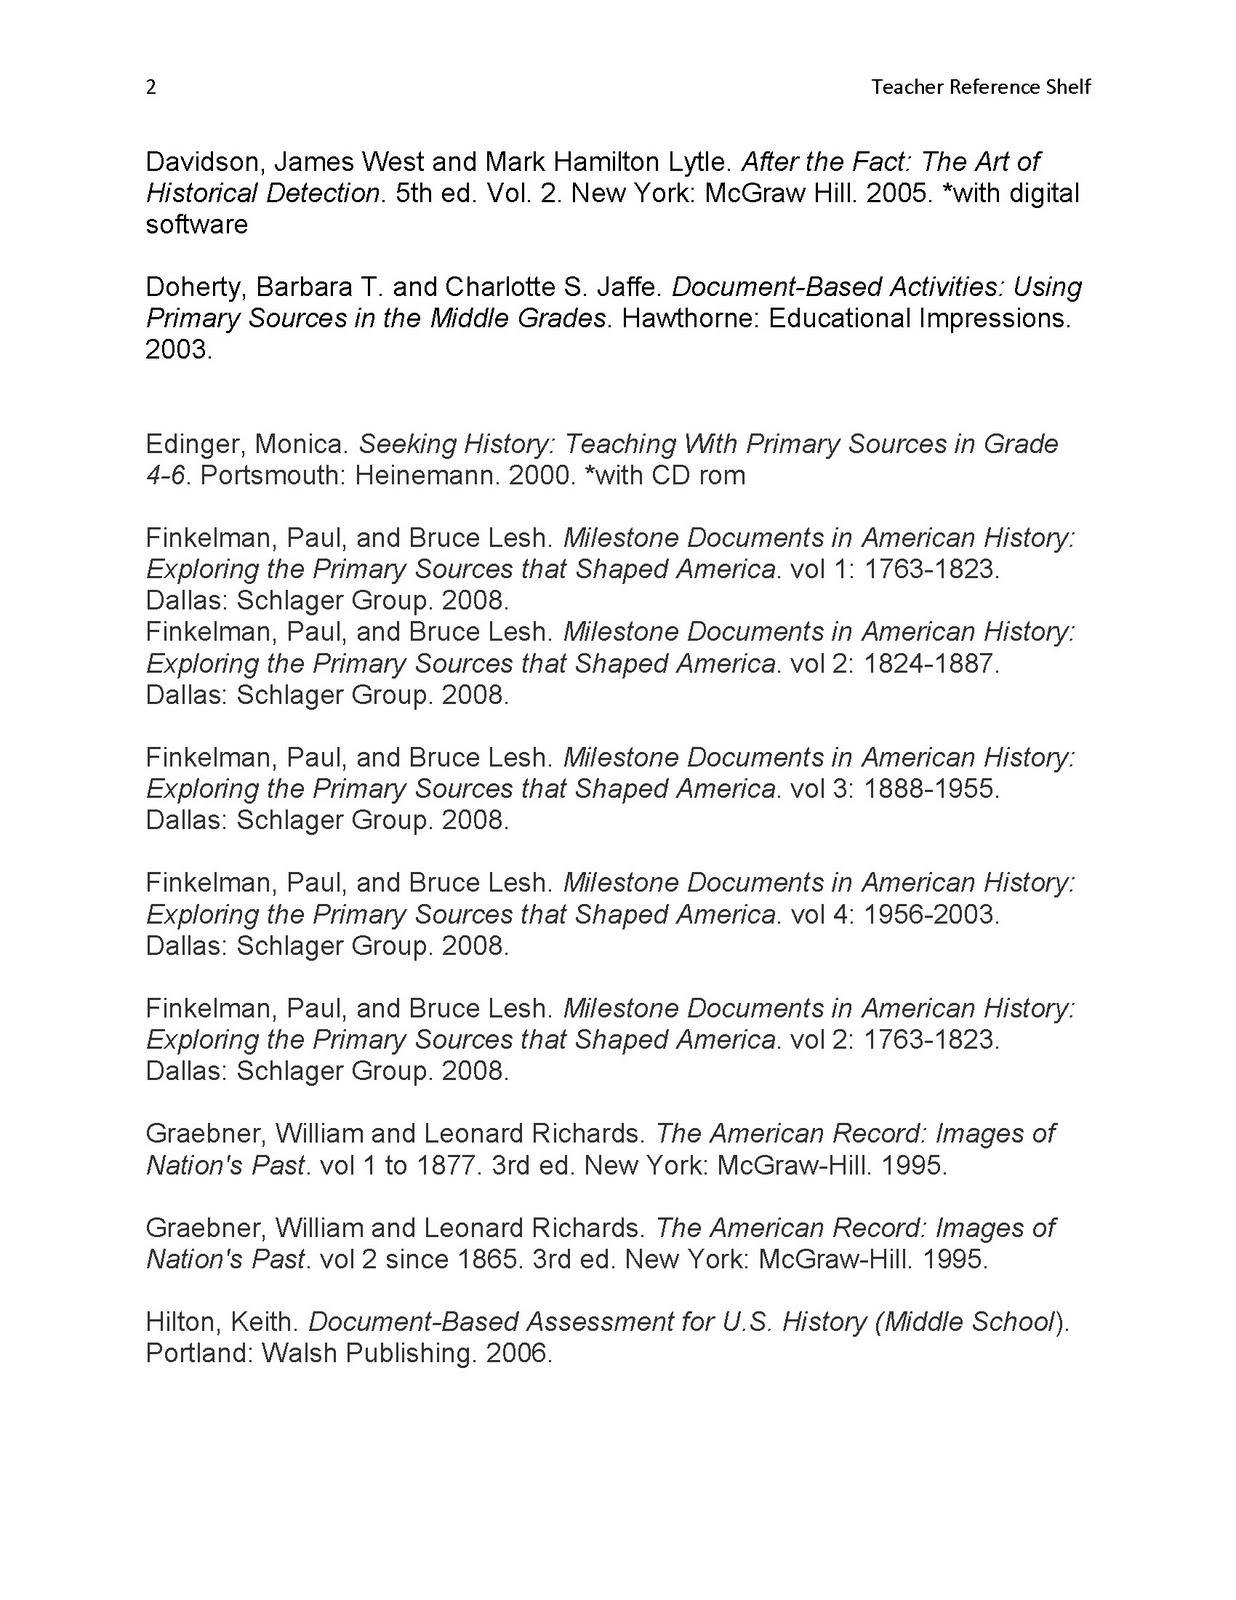 Primary Source Seminar Teacher Reference Shelf